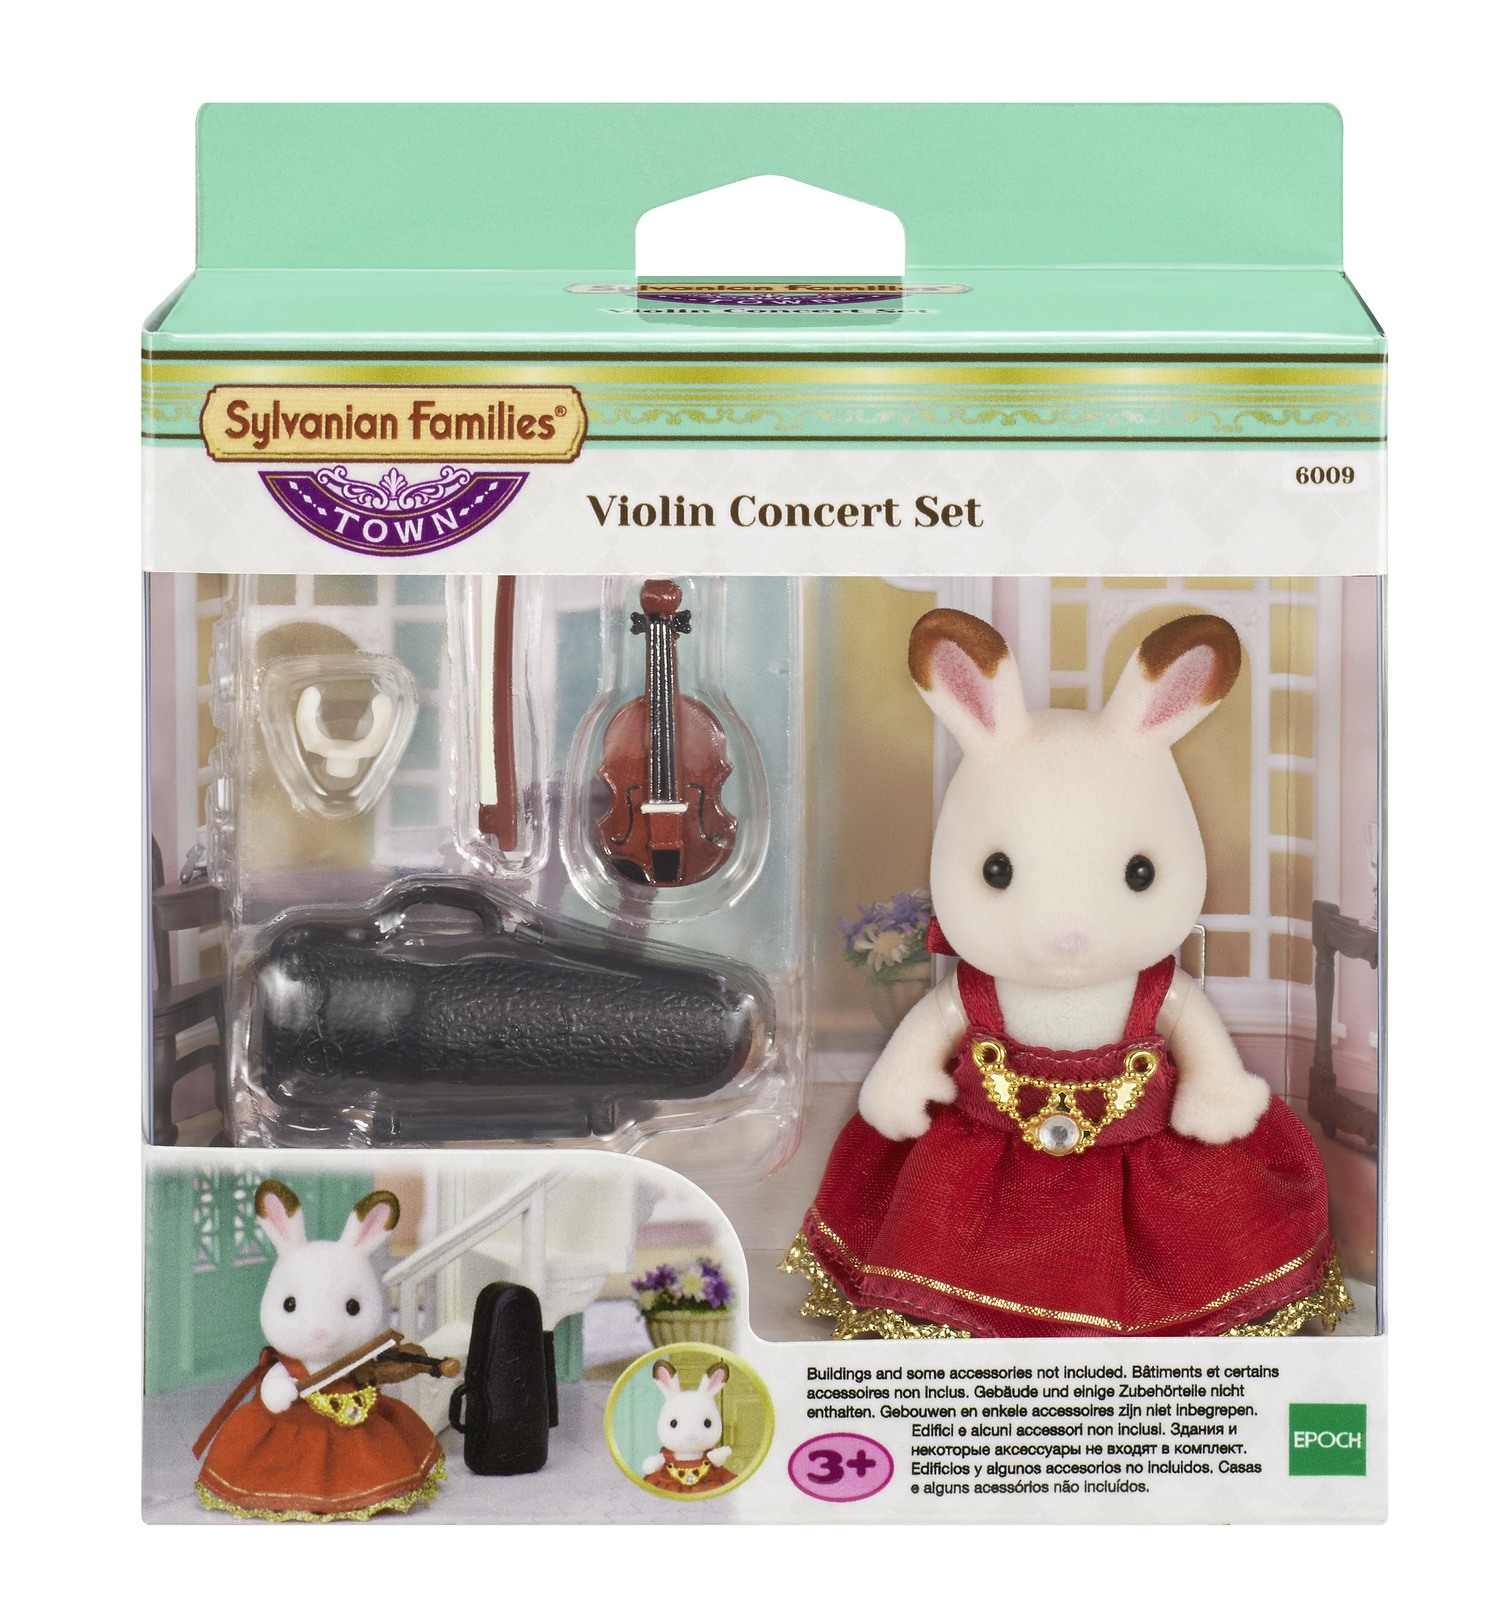 Sylvanian Families: Violin Concert Set image